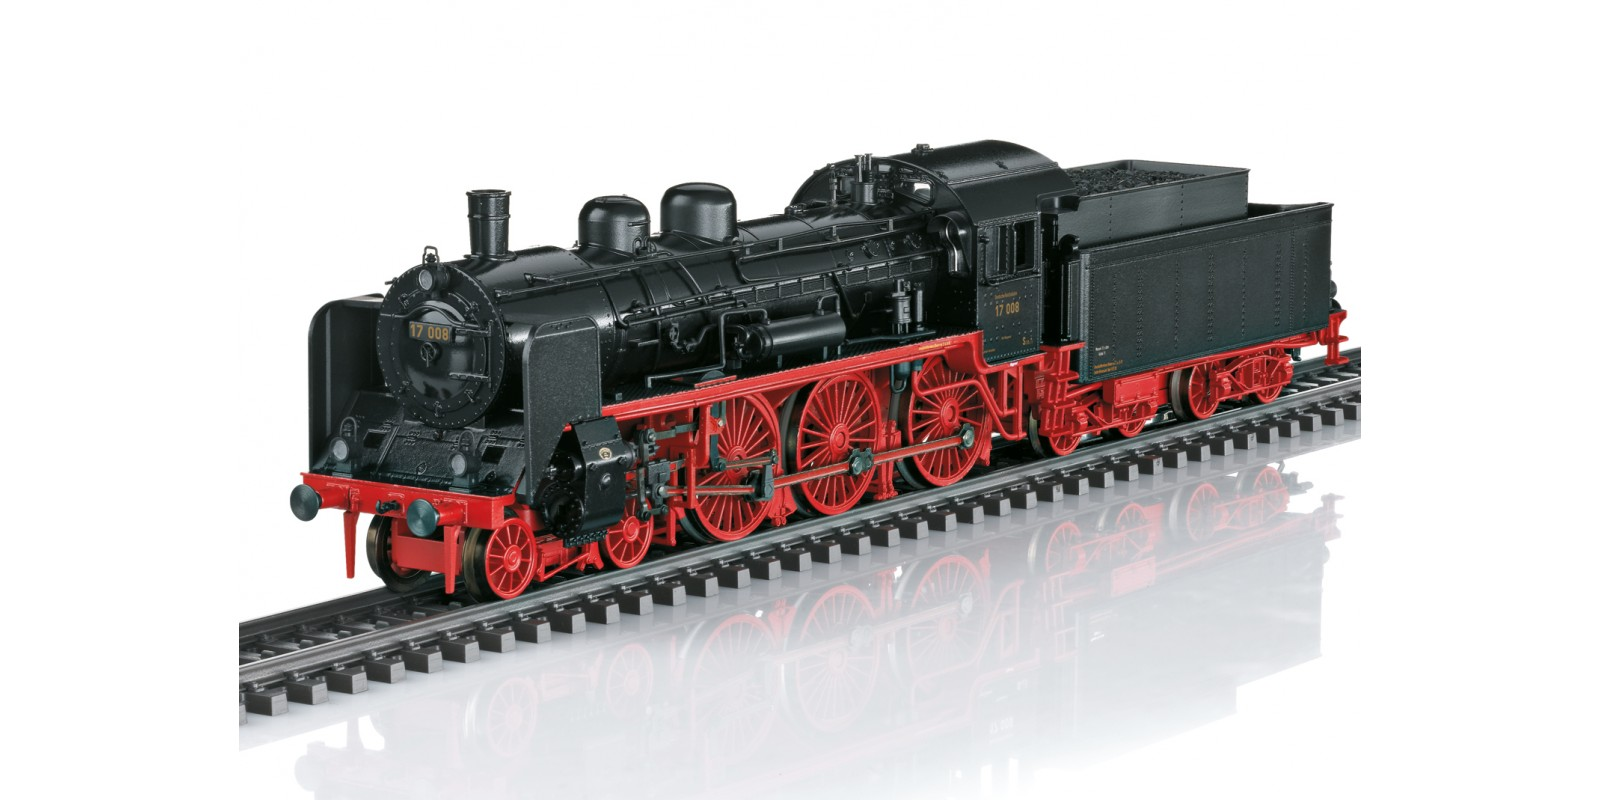 037197 Class 17 Steam Locomotive